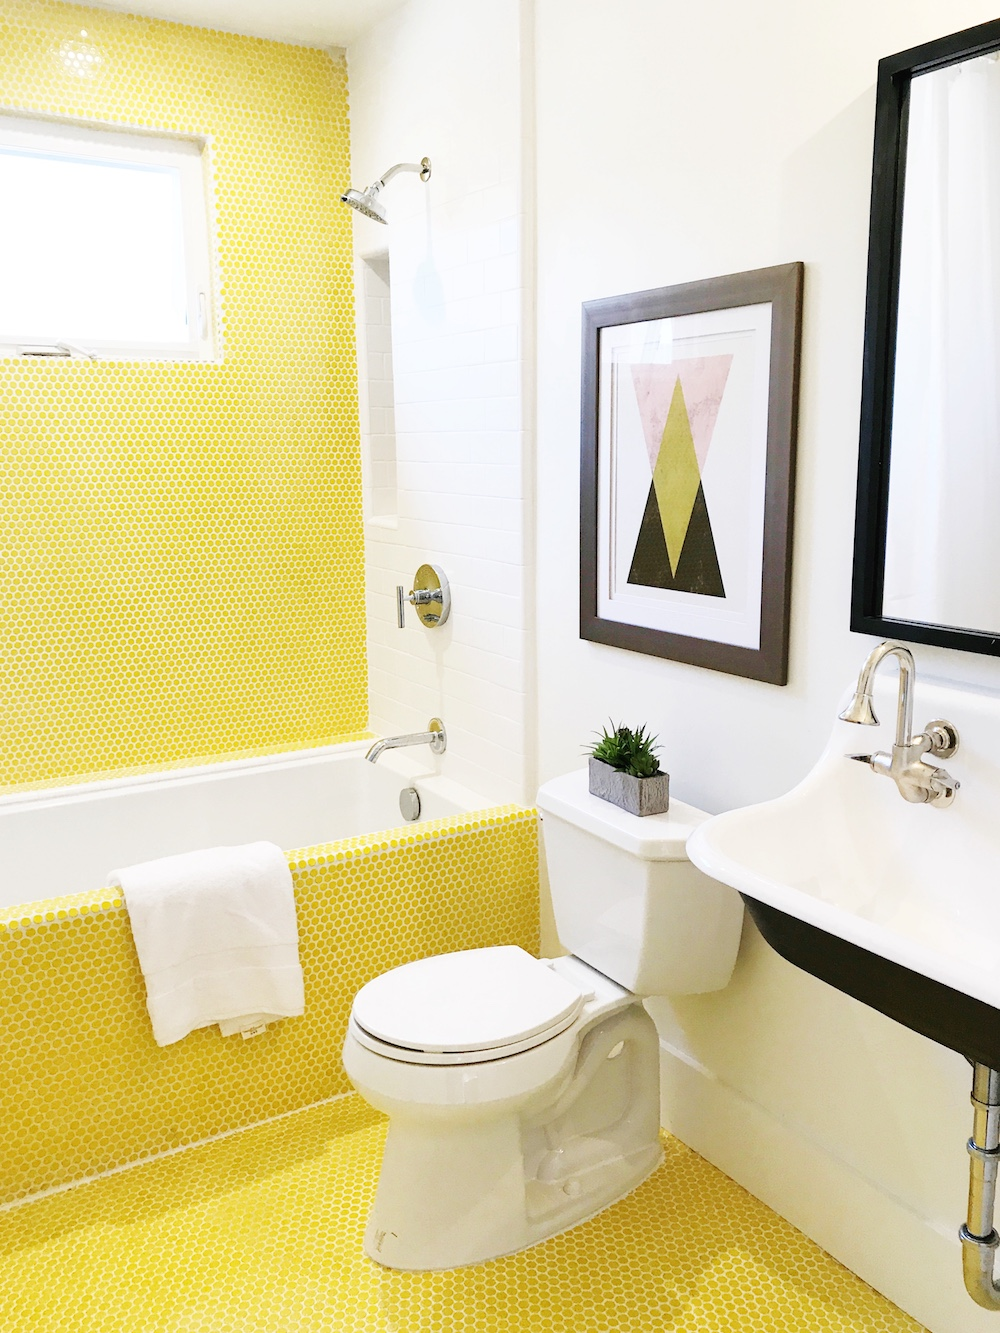 Yellow Penny Tiles in Bathroom